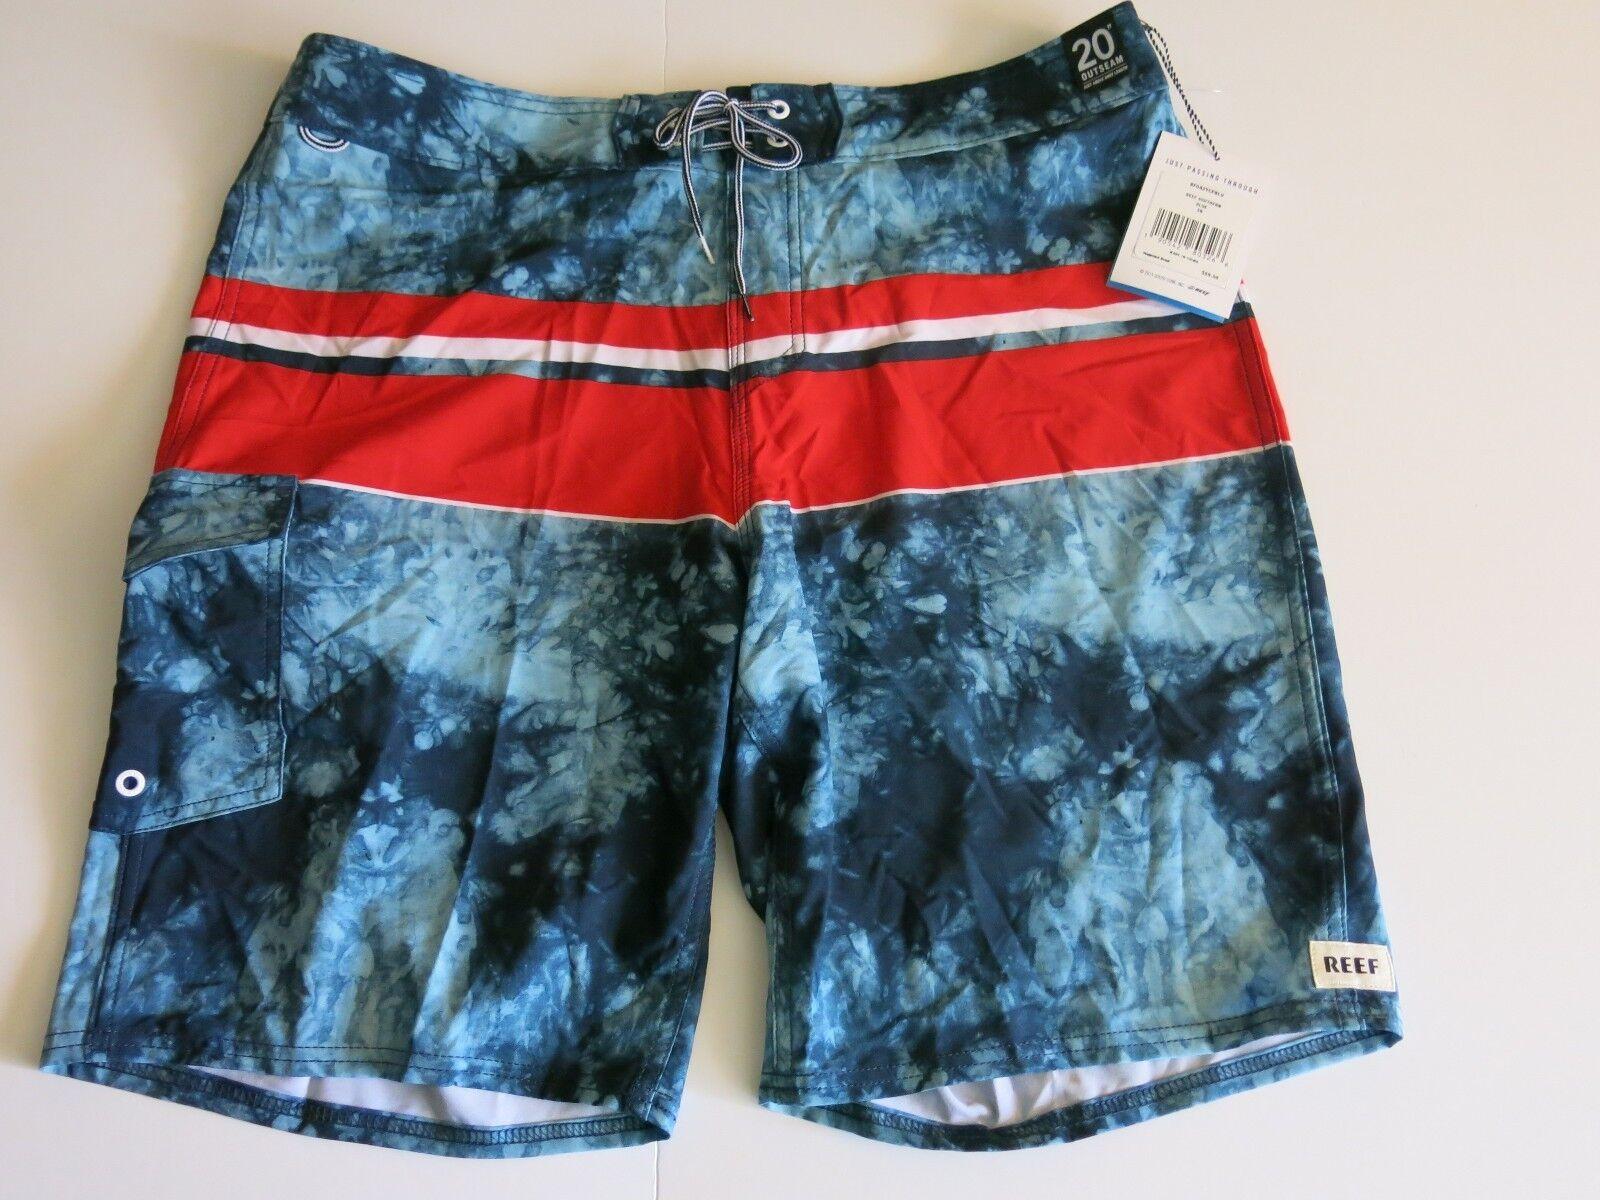 NWT Men's Reef 36 Surf Swim Board Shorts bluee Tie Dye Red White Stripe Southern